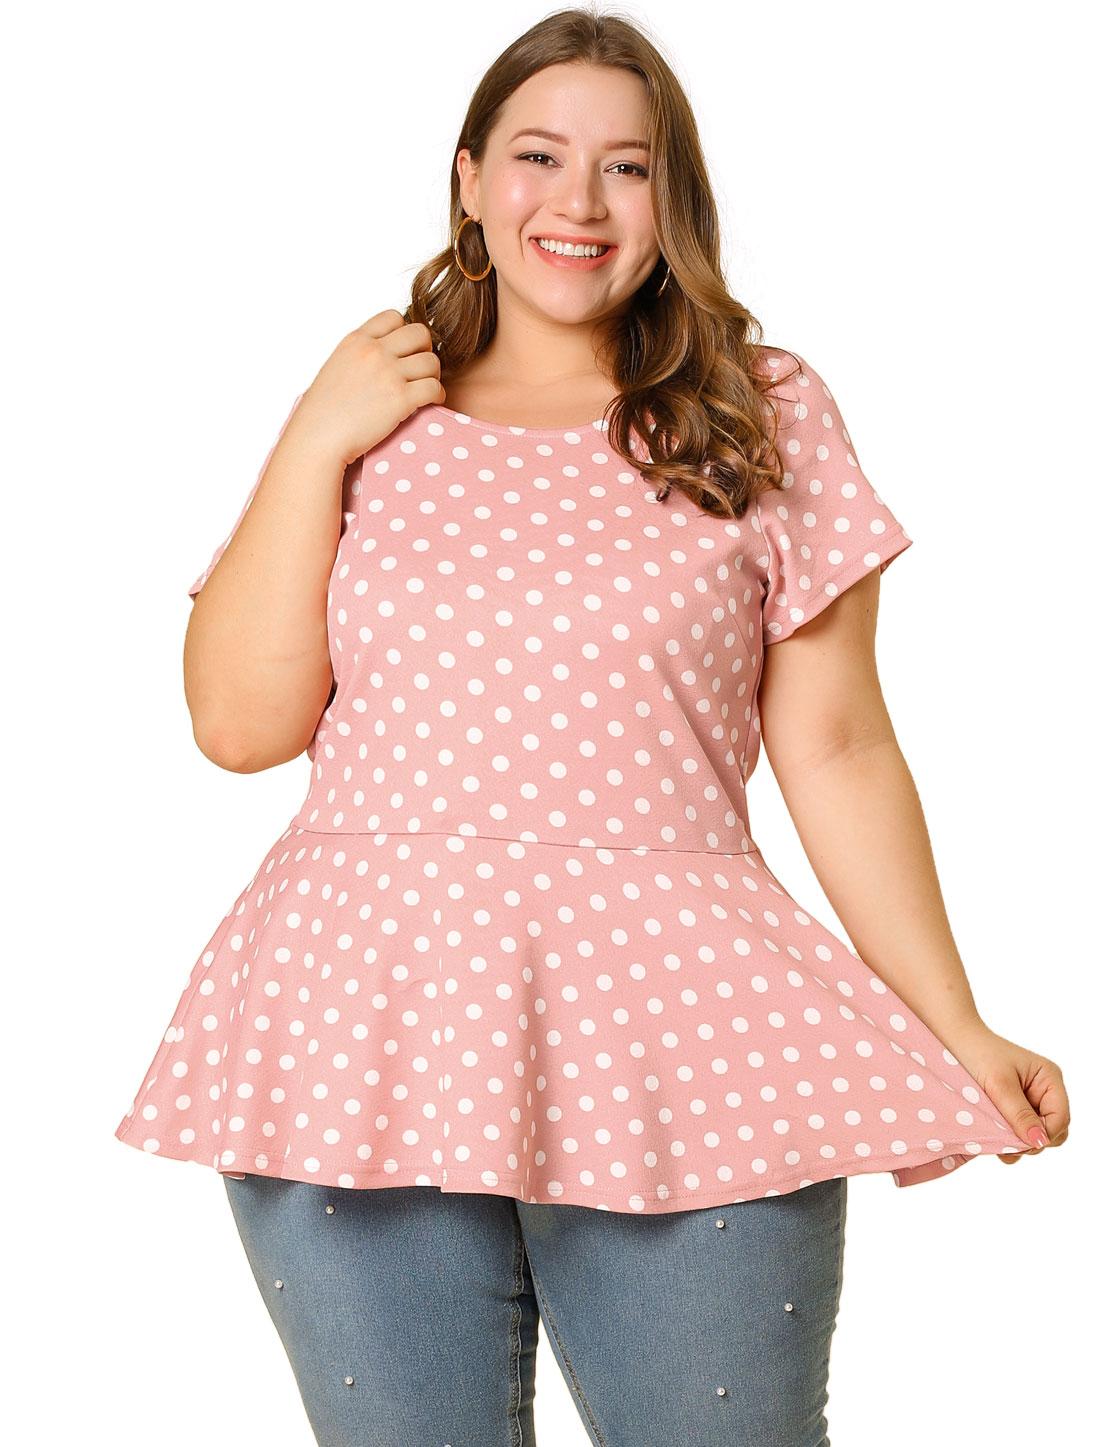 Women Plus Size Short Sleeves Polka Dots Peplum Top Pink 4X